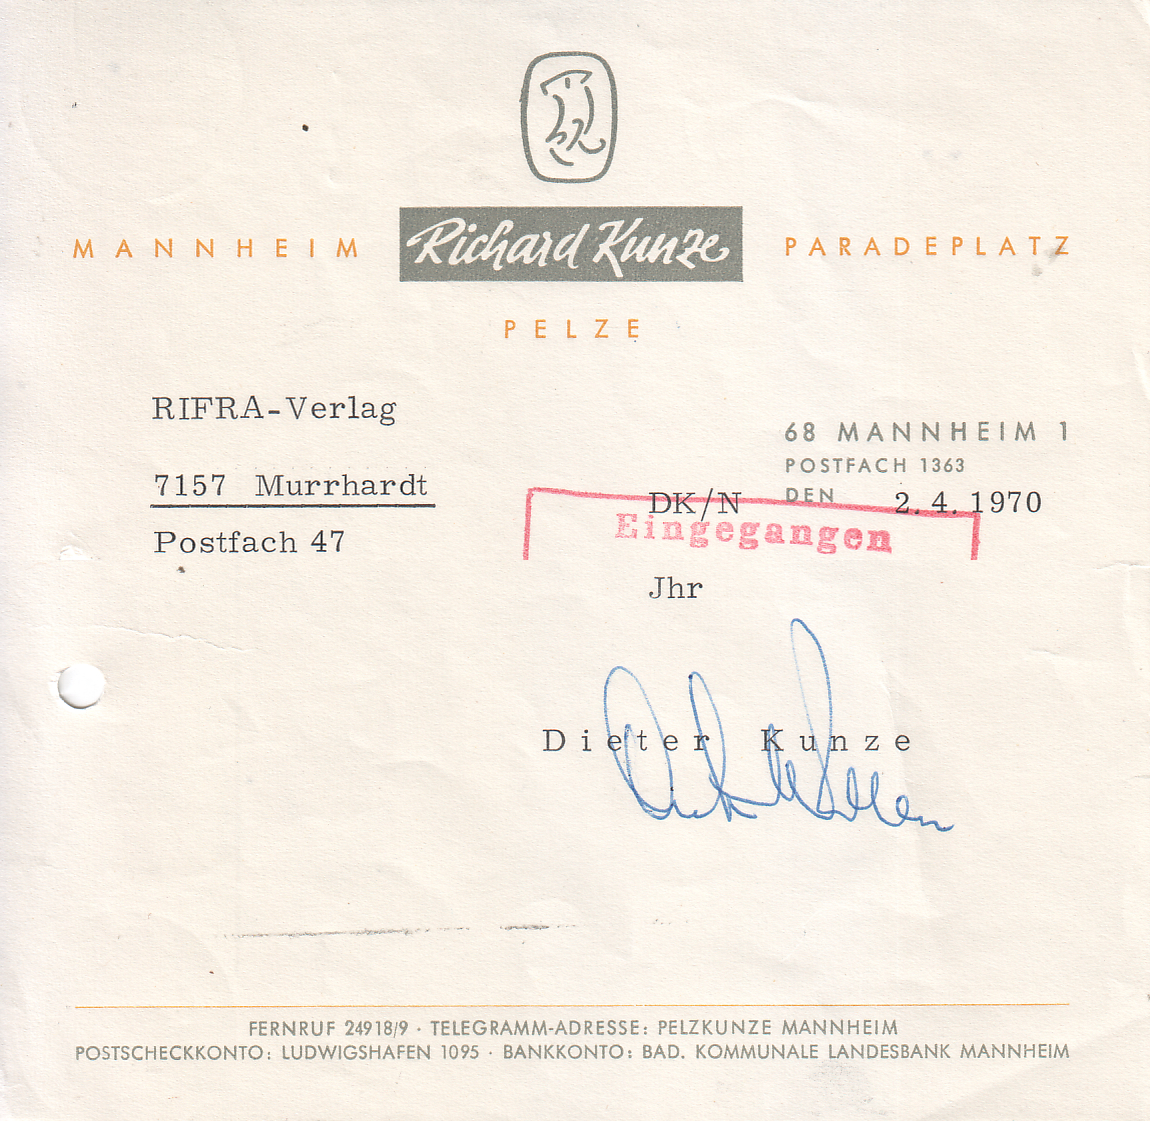 Filepelzhaus Richard Kunze Mannheim 1970 Briefkopfjpg